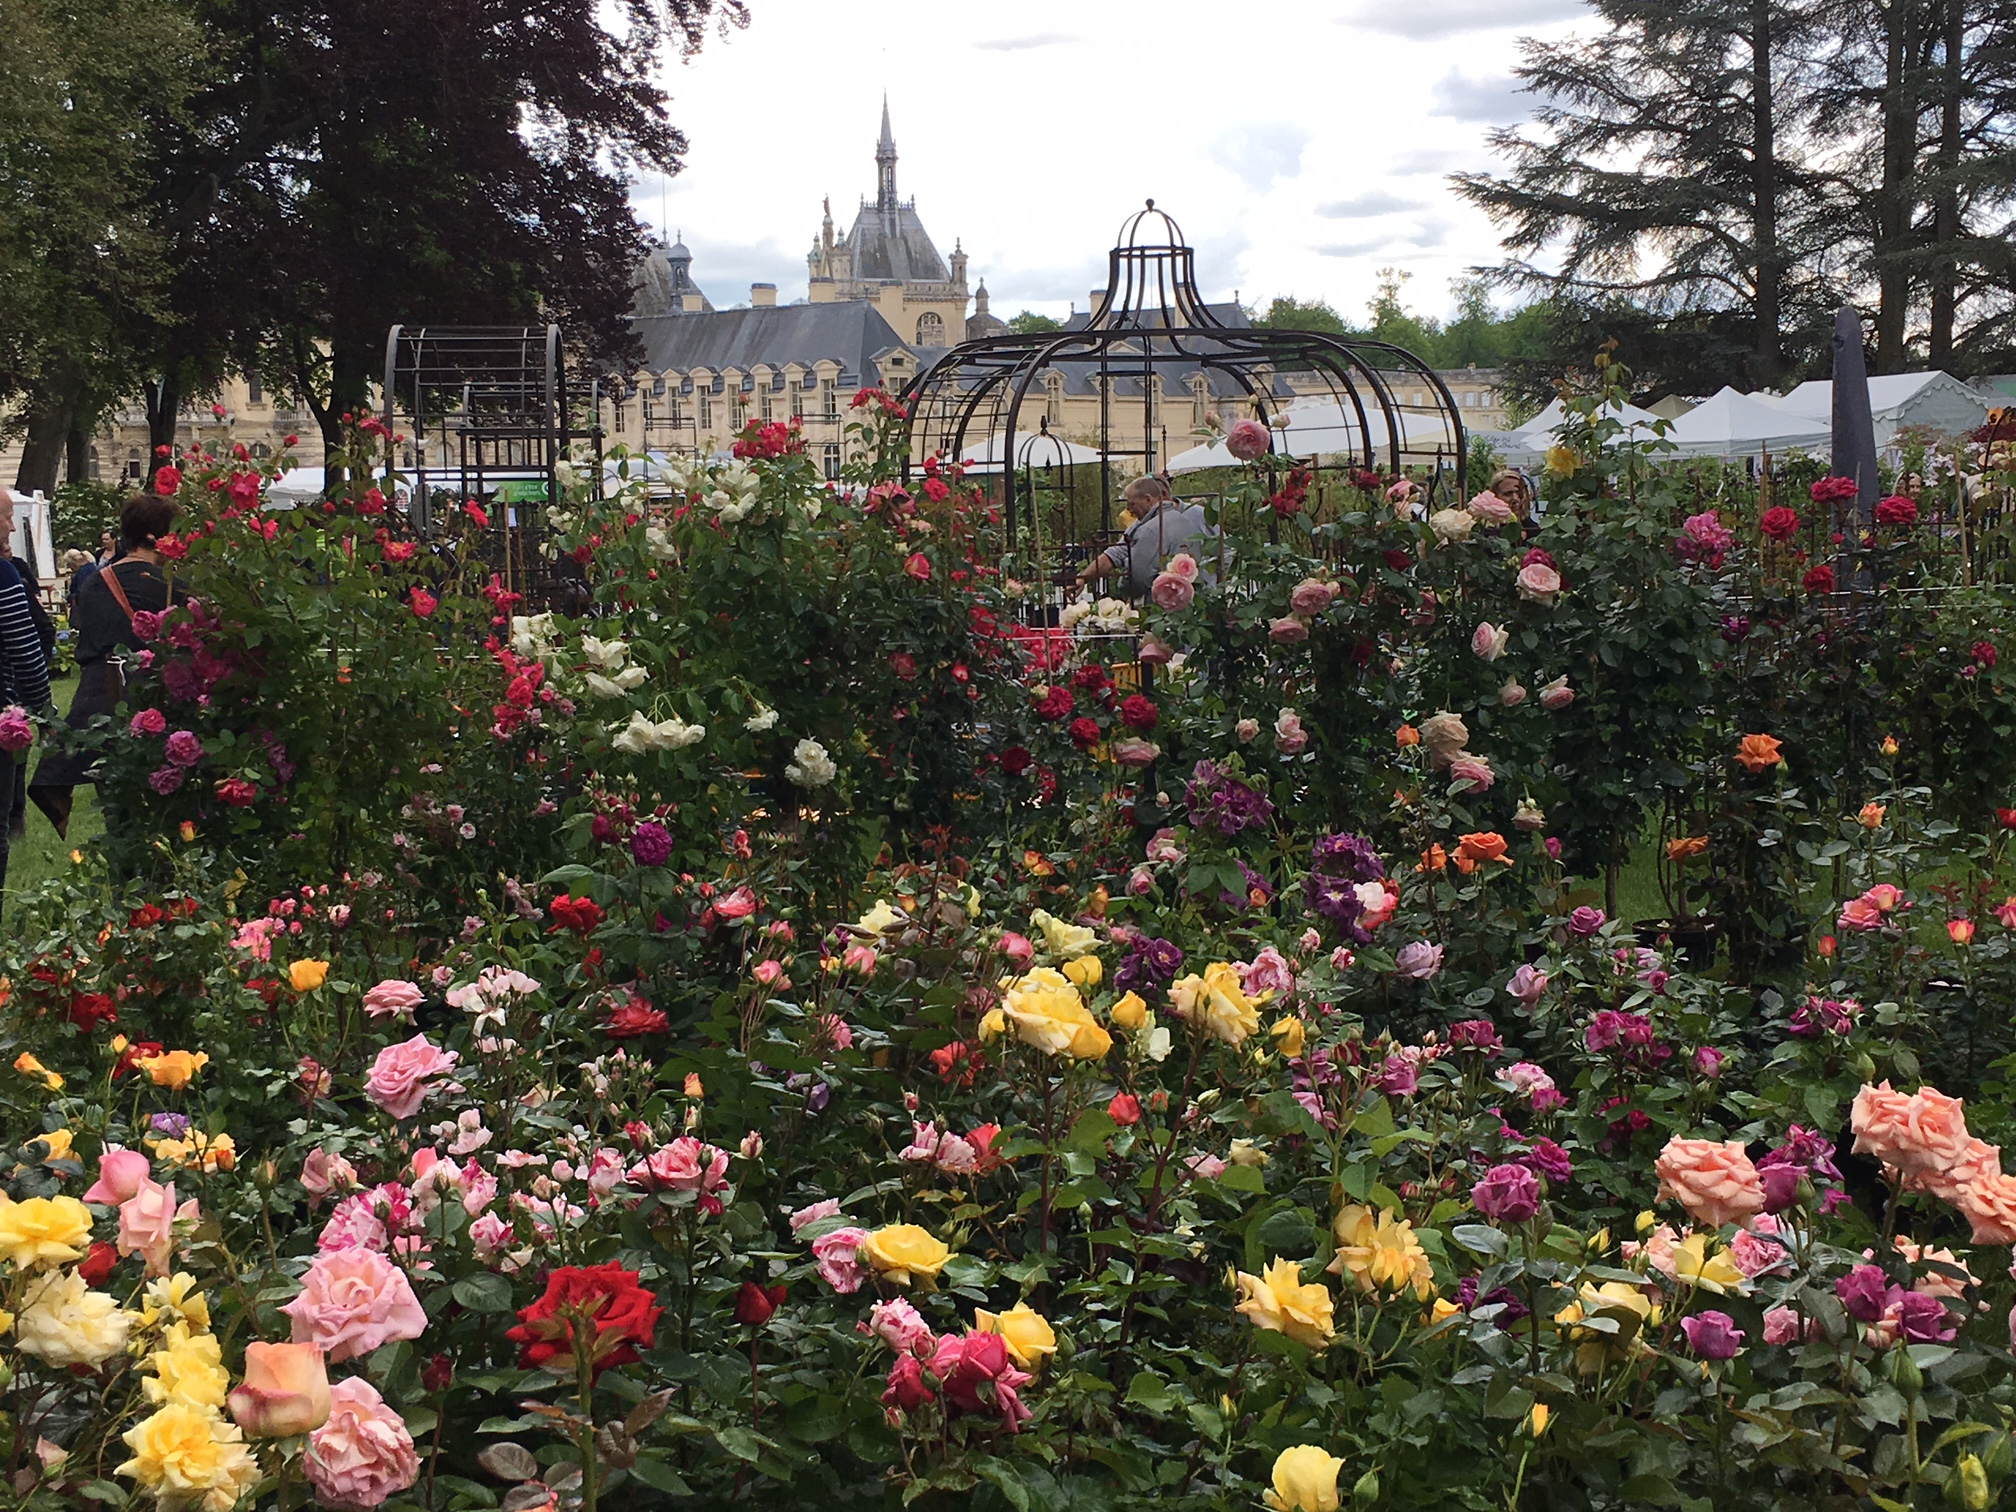 Chantilly the french chelsea les journ es des plantes - Journee des plantes chantilly ...